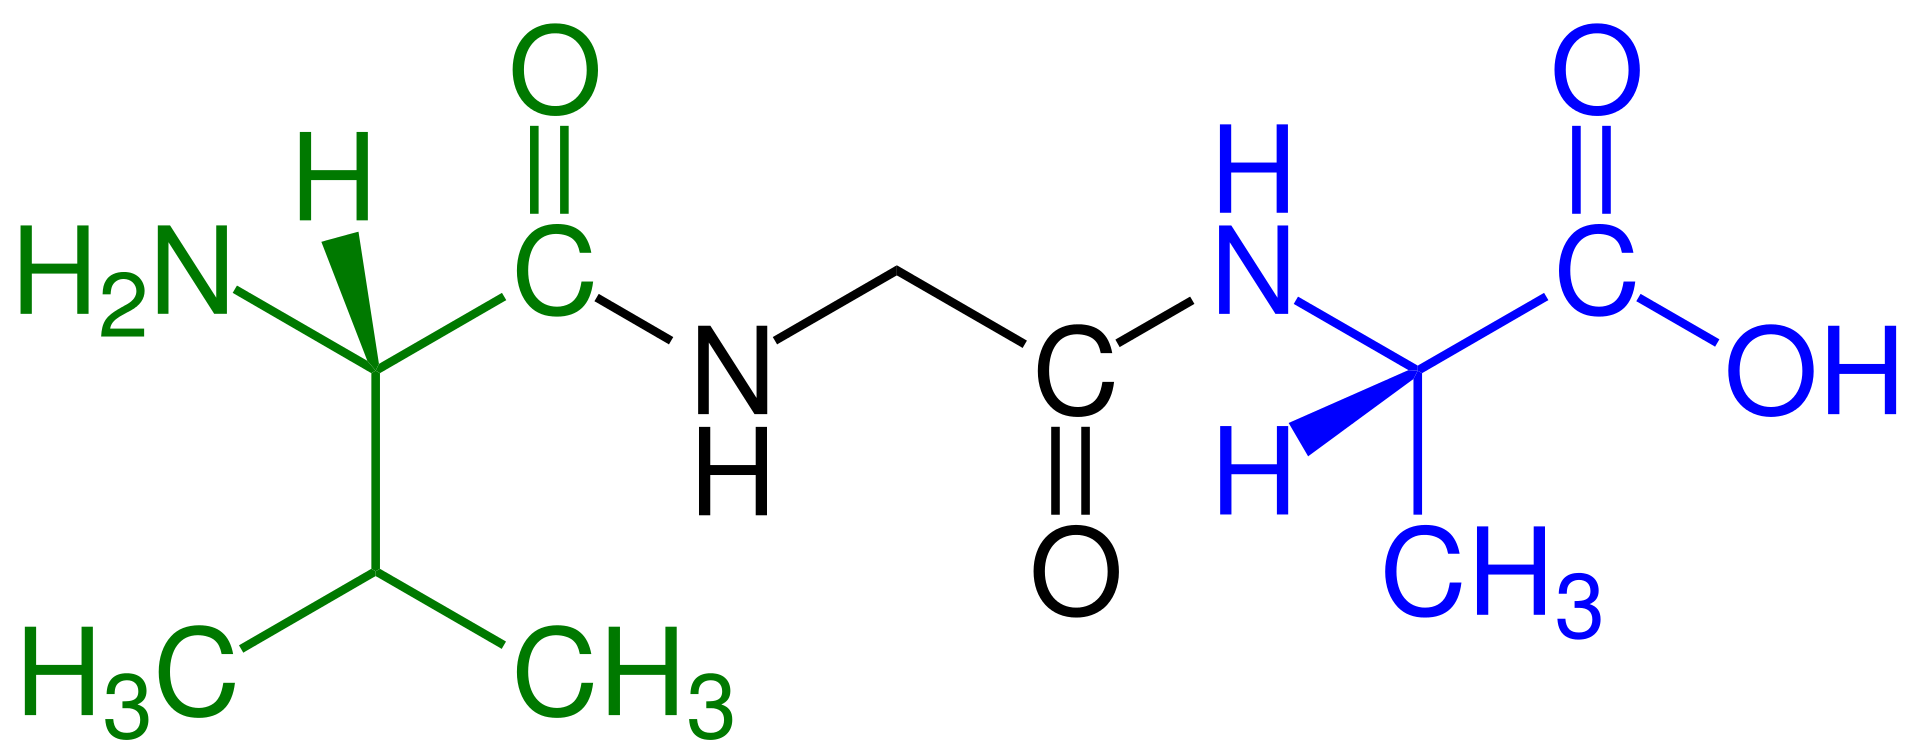 Key Difference - Oligopeptide vs Polypeptide